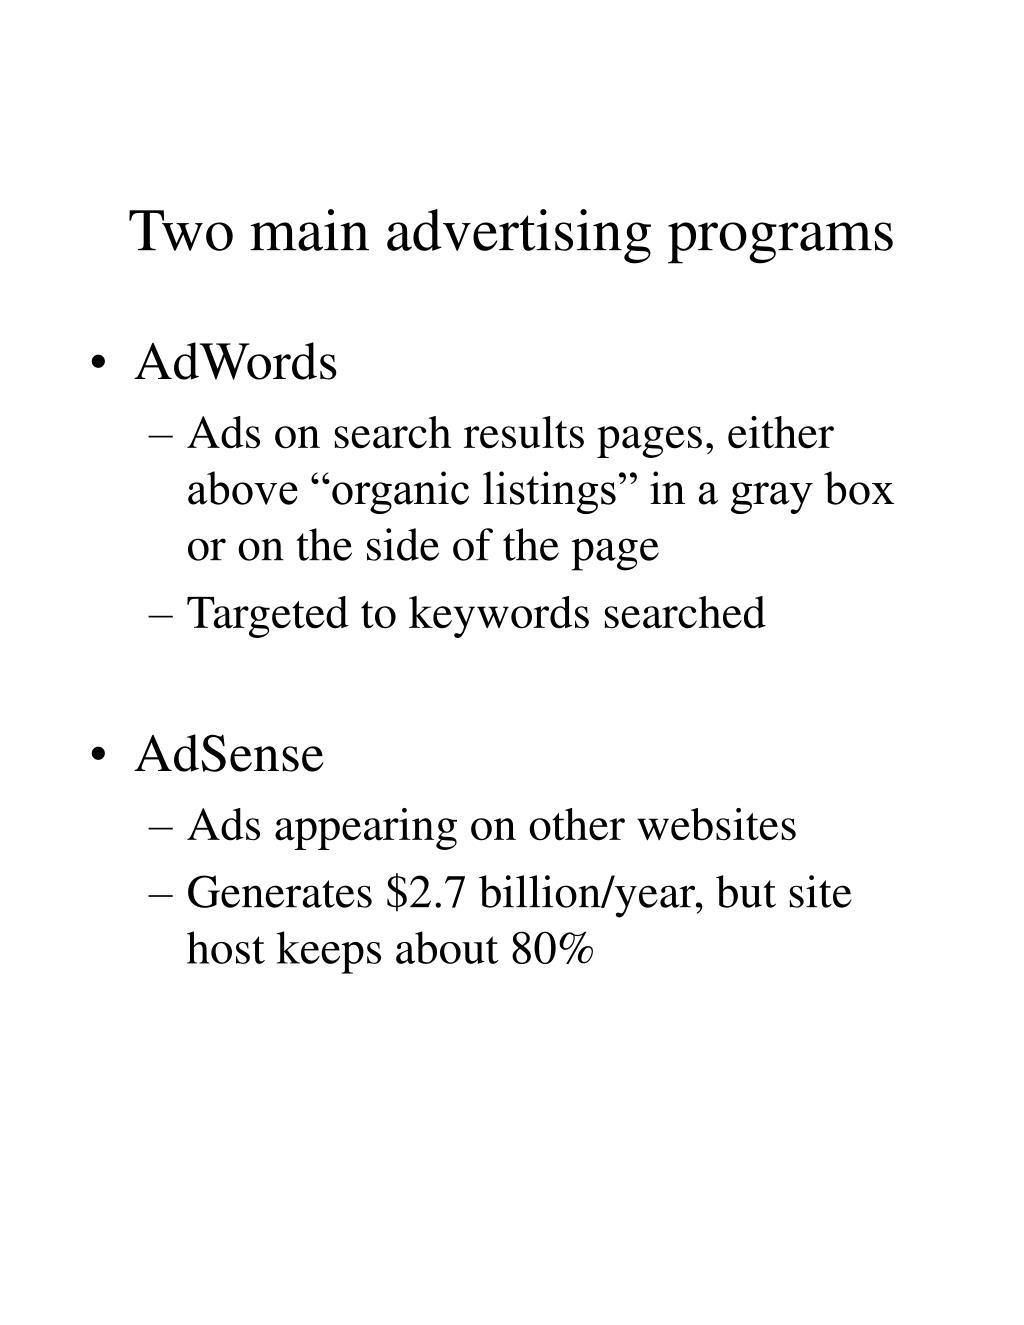 Two main advertising programs